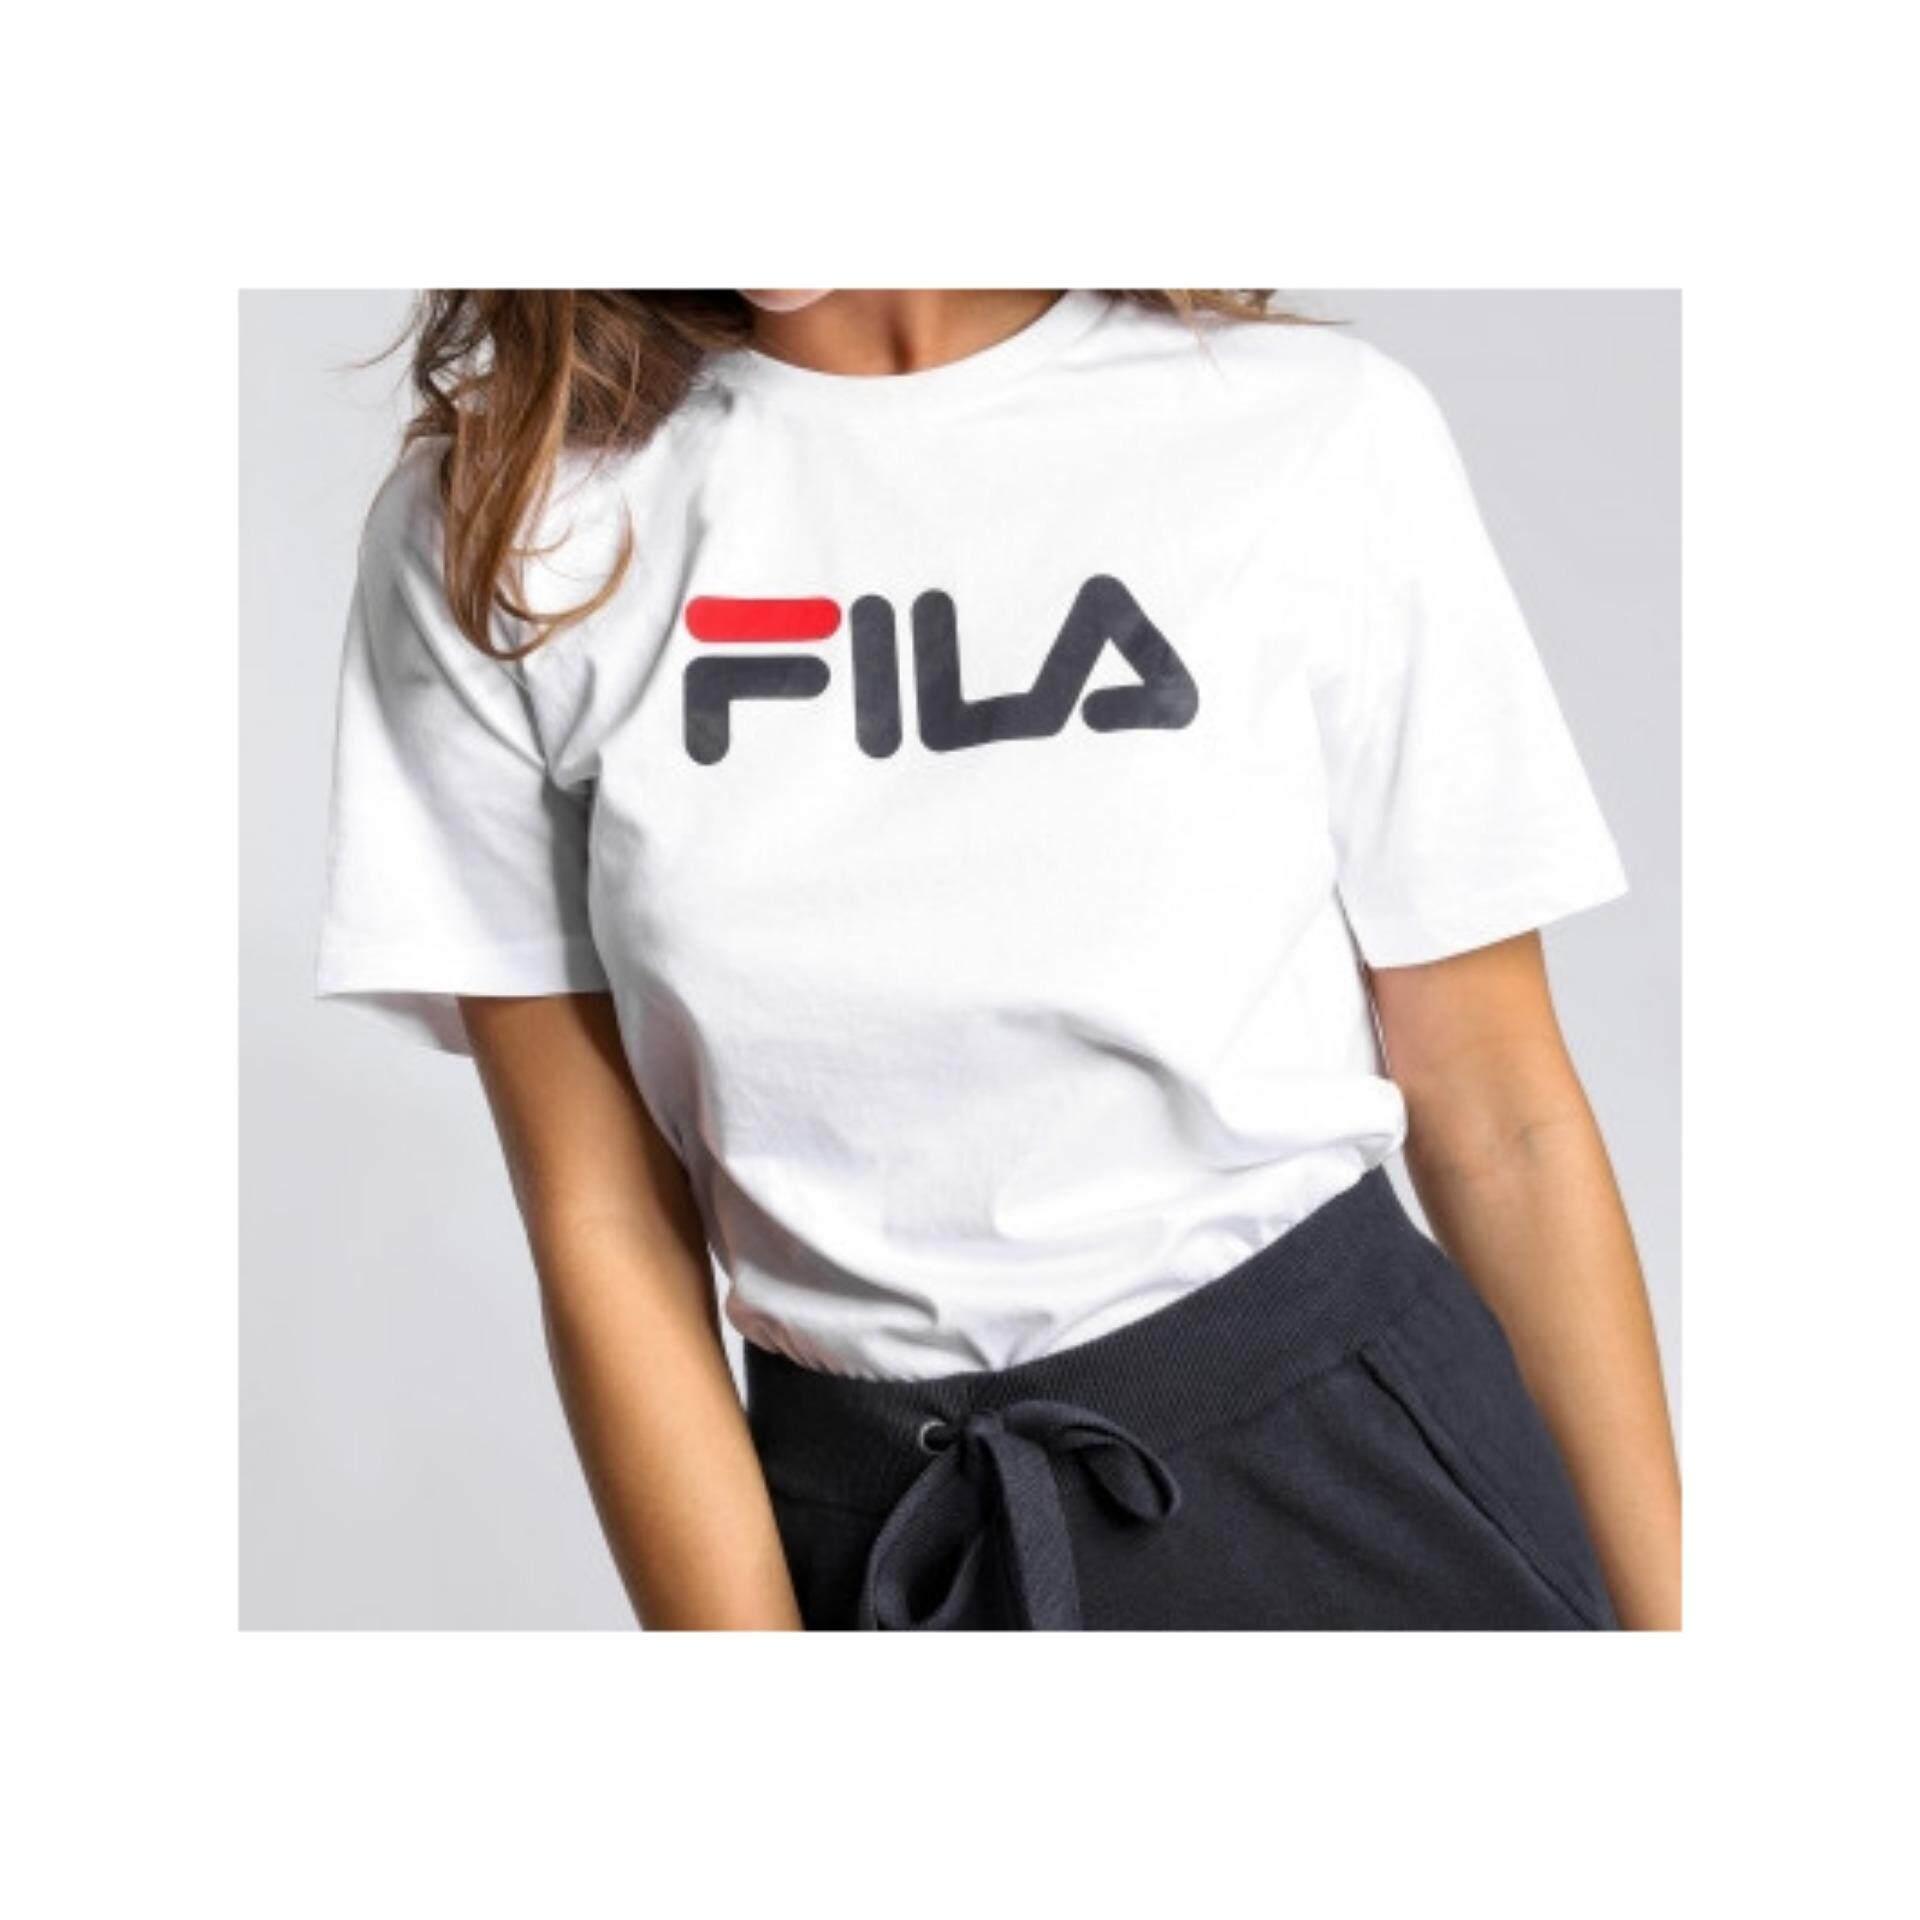 fila t shirt malaysia